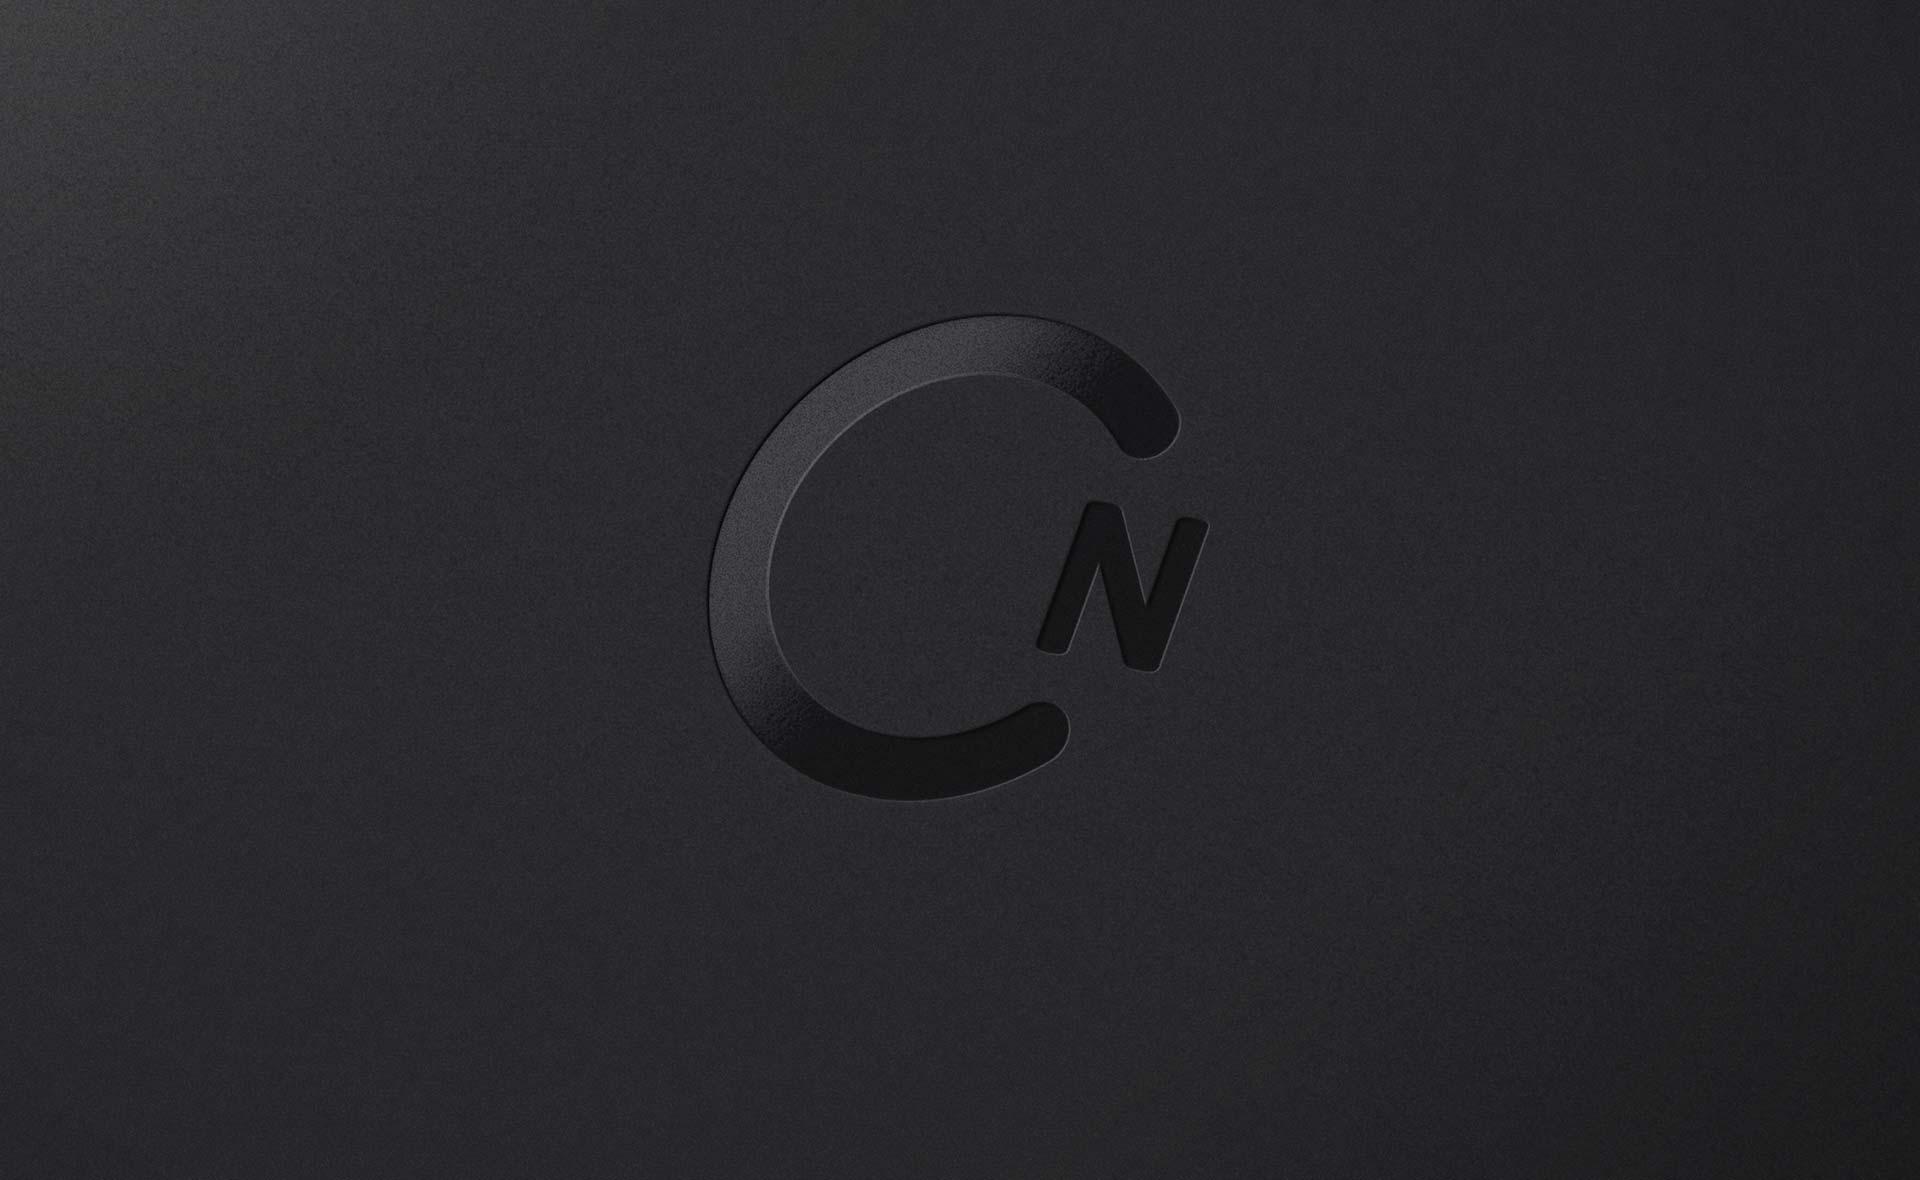 Artfatale-Case-CaesarNordpol-1920×1180-2